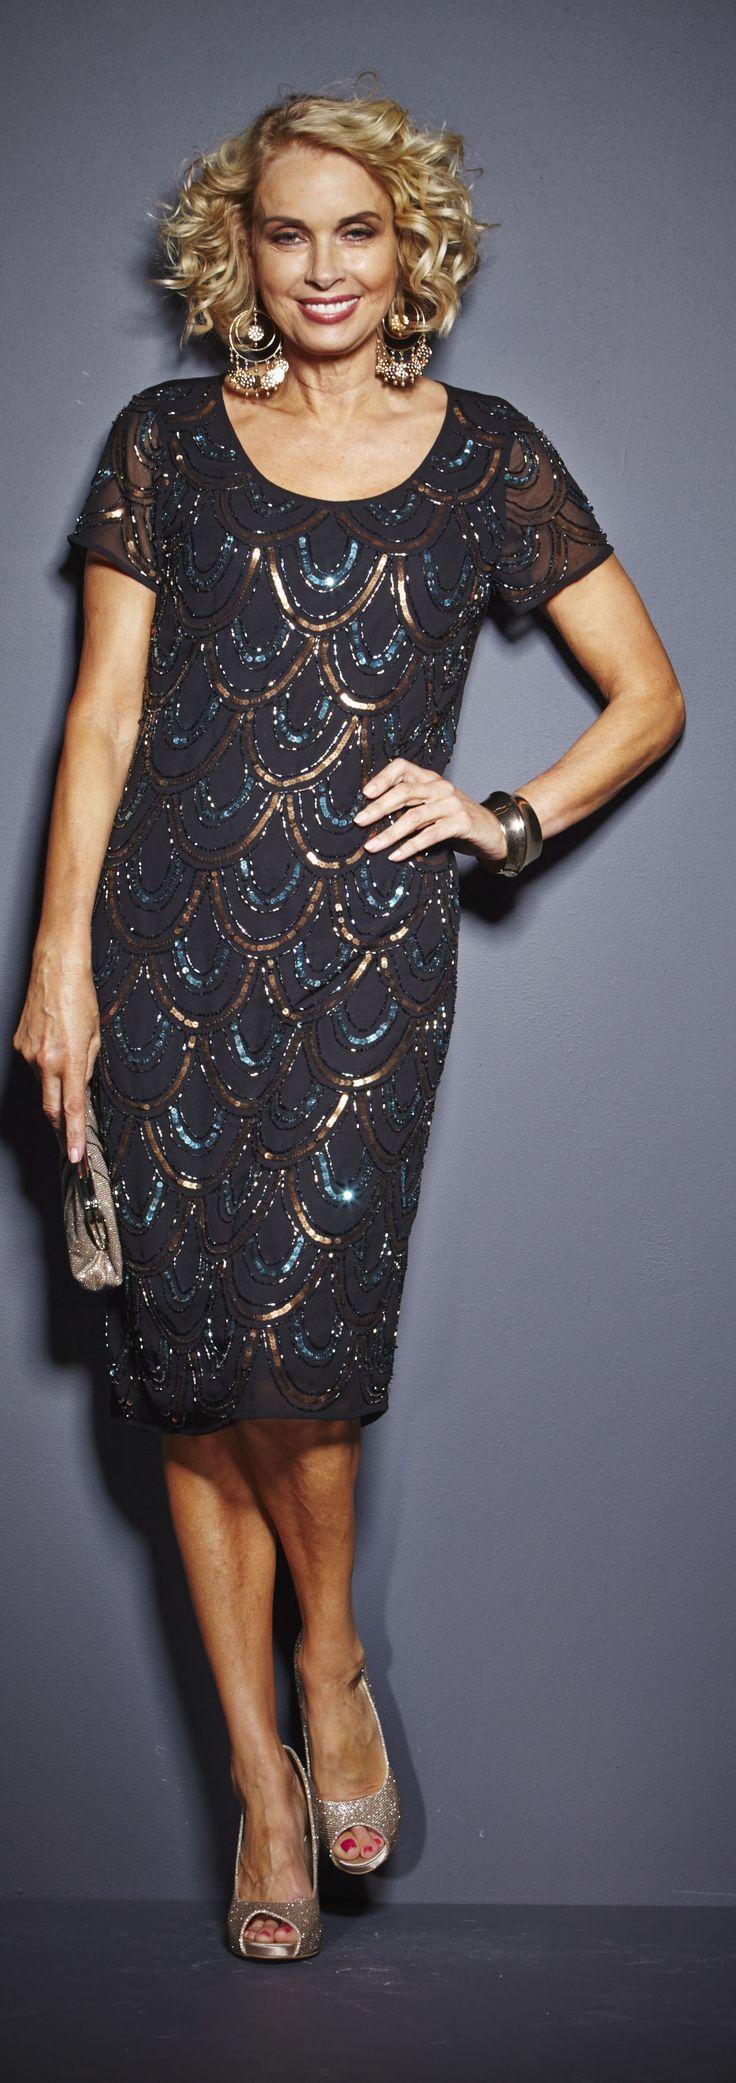 Perfect Womenu0026#39;s Banquet Formal Dress Dinner Party Jumpsuit Pants Evening Dress | Fashion | Pinterest ...